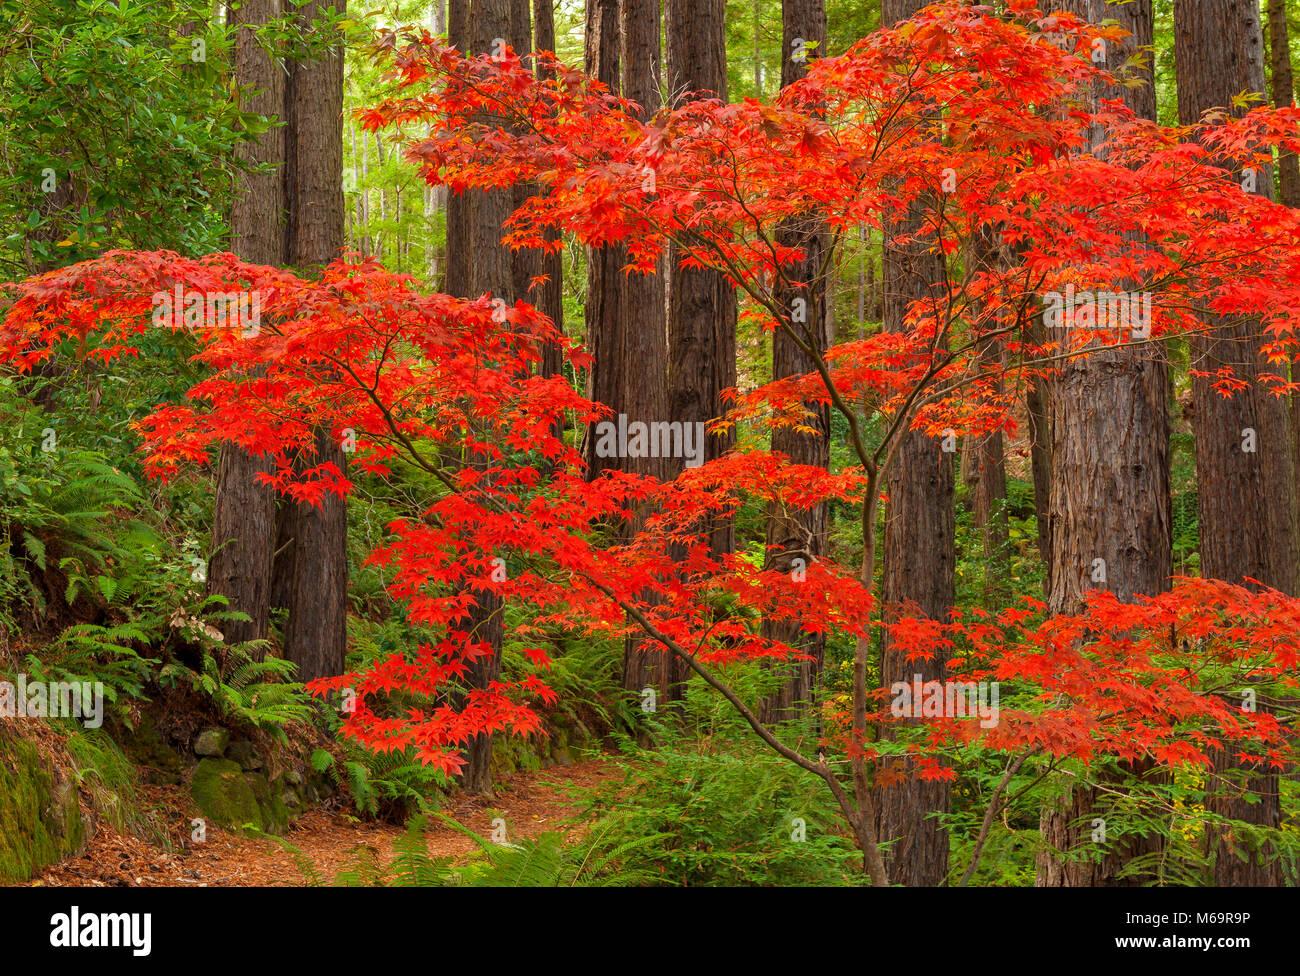 Japanischer Ahorn, Mammutbäume, Farn Schlucht Garten, Mill Valley, Kalifornien Stockbild